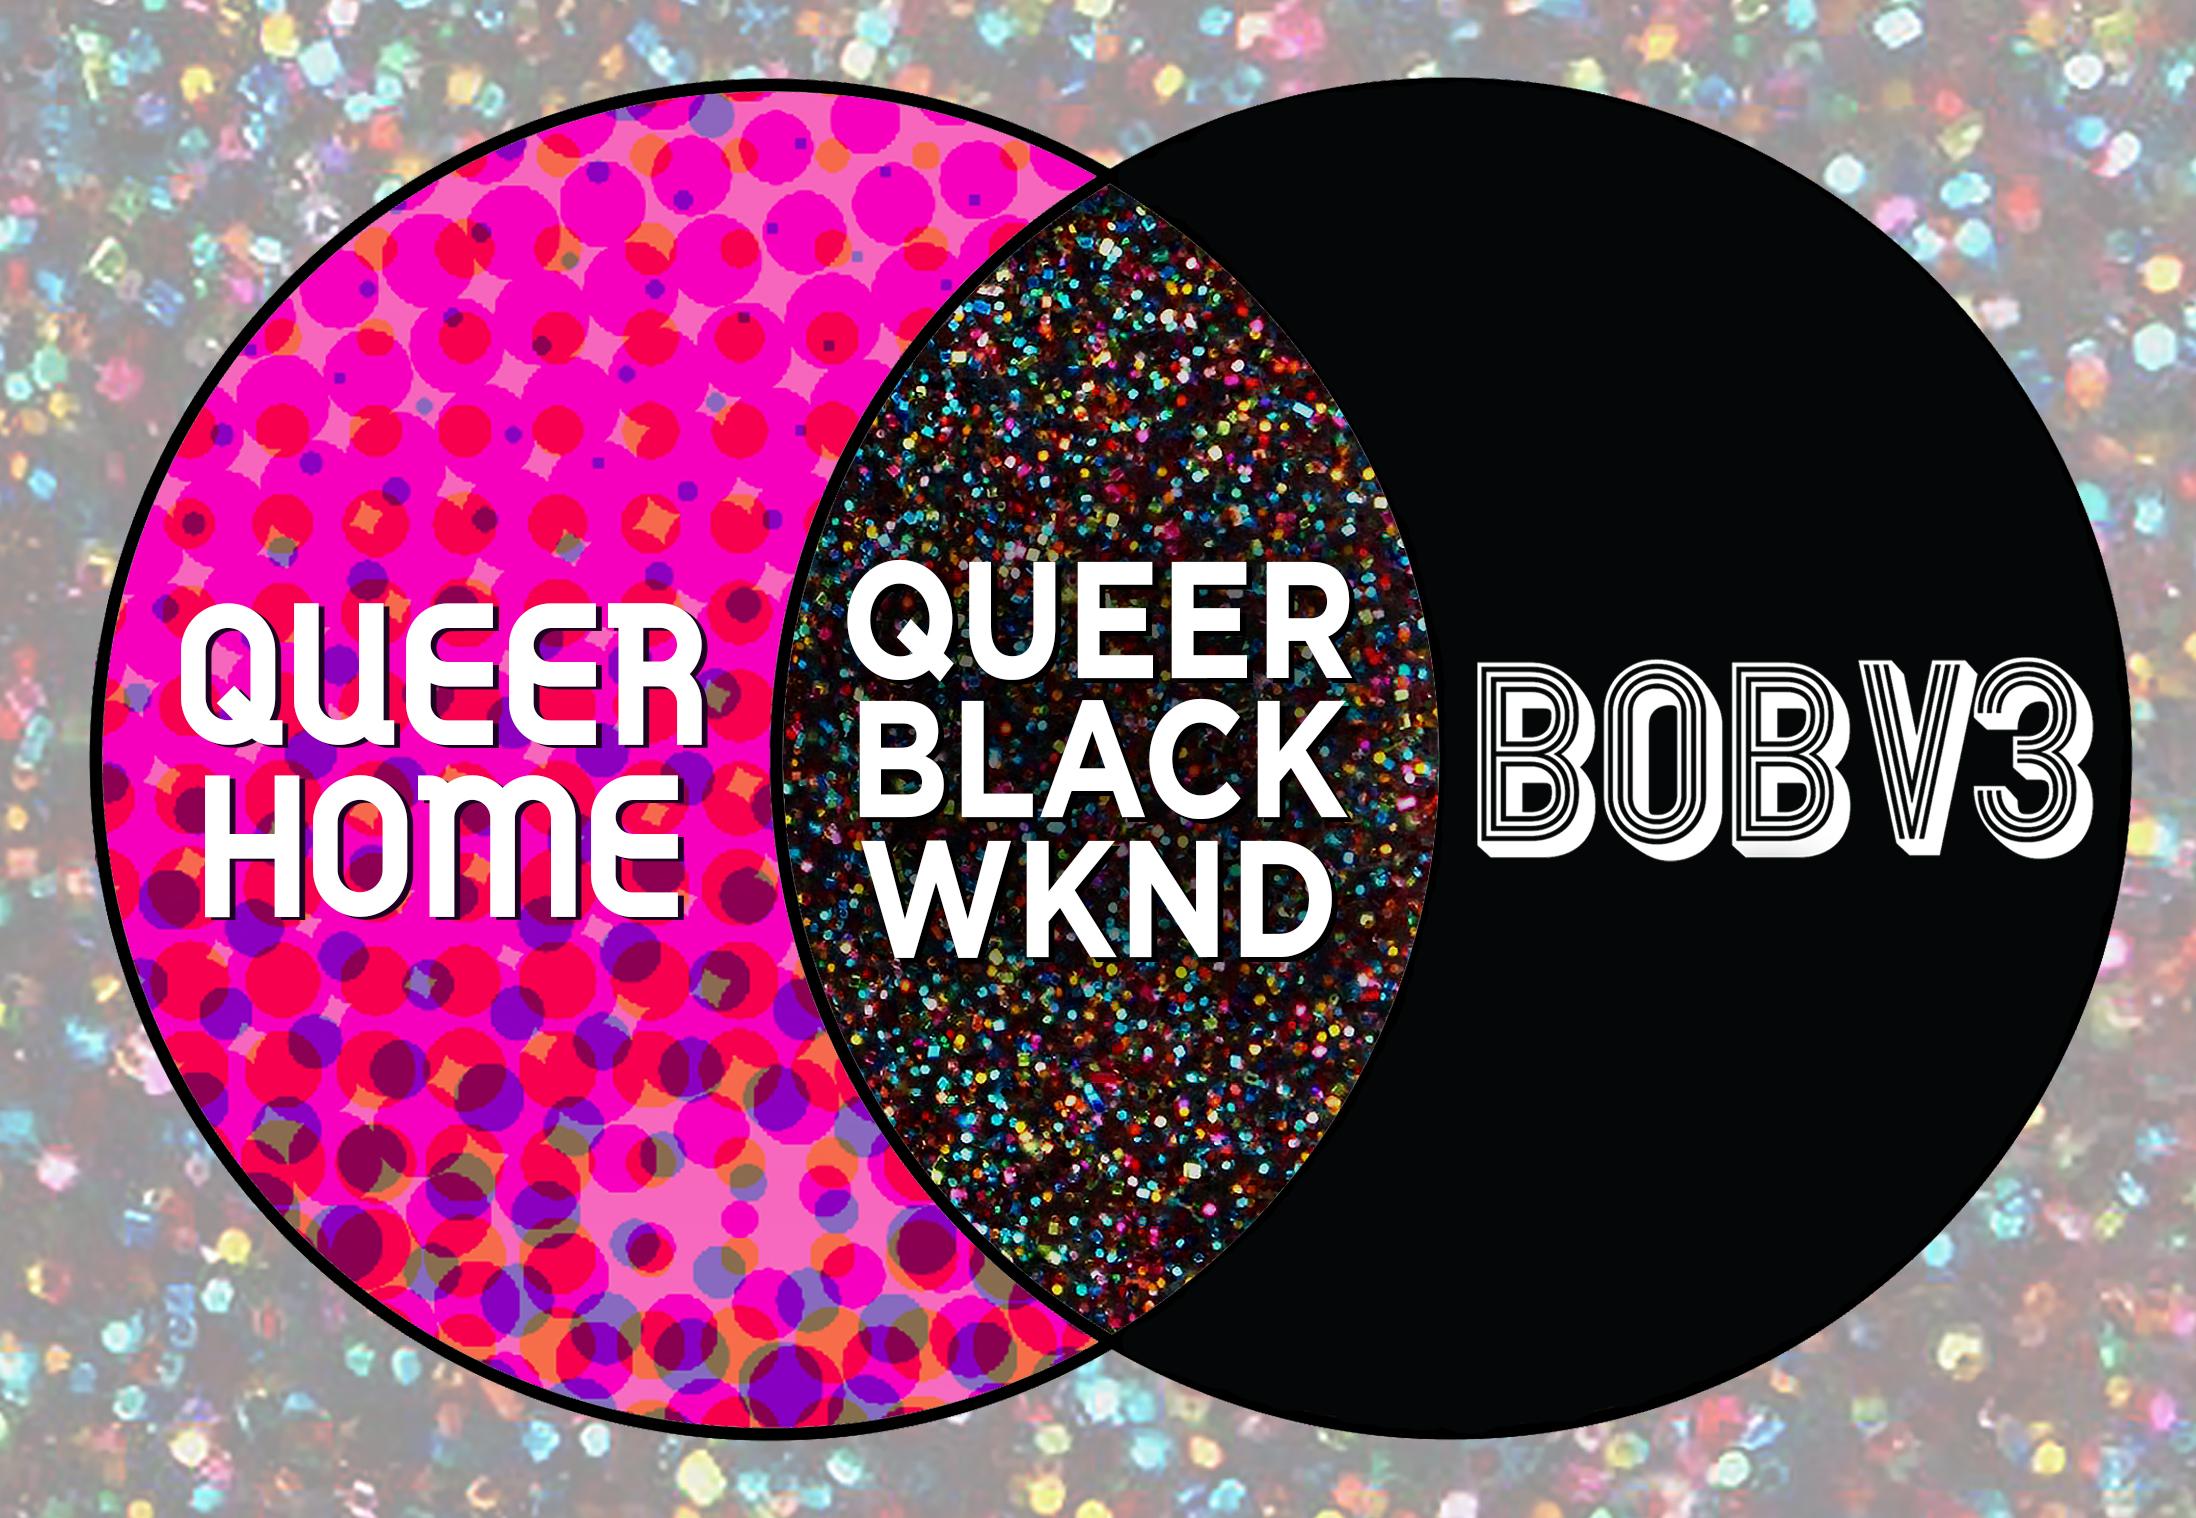 queer black wknd rectangle.jpg